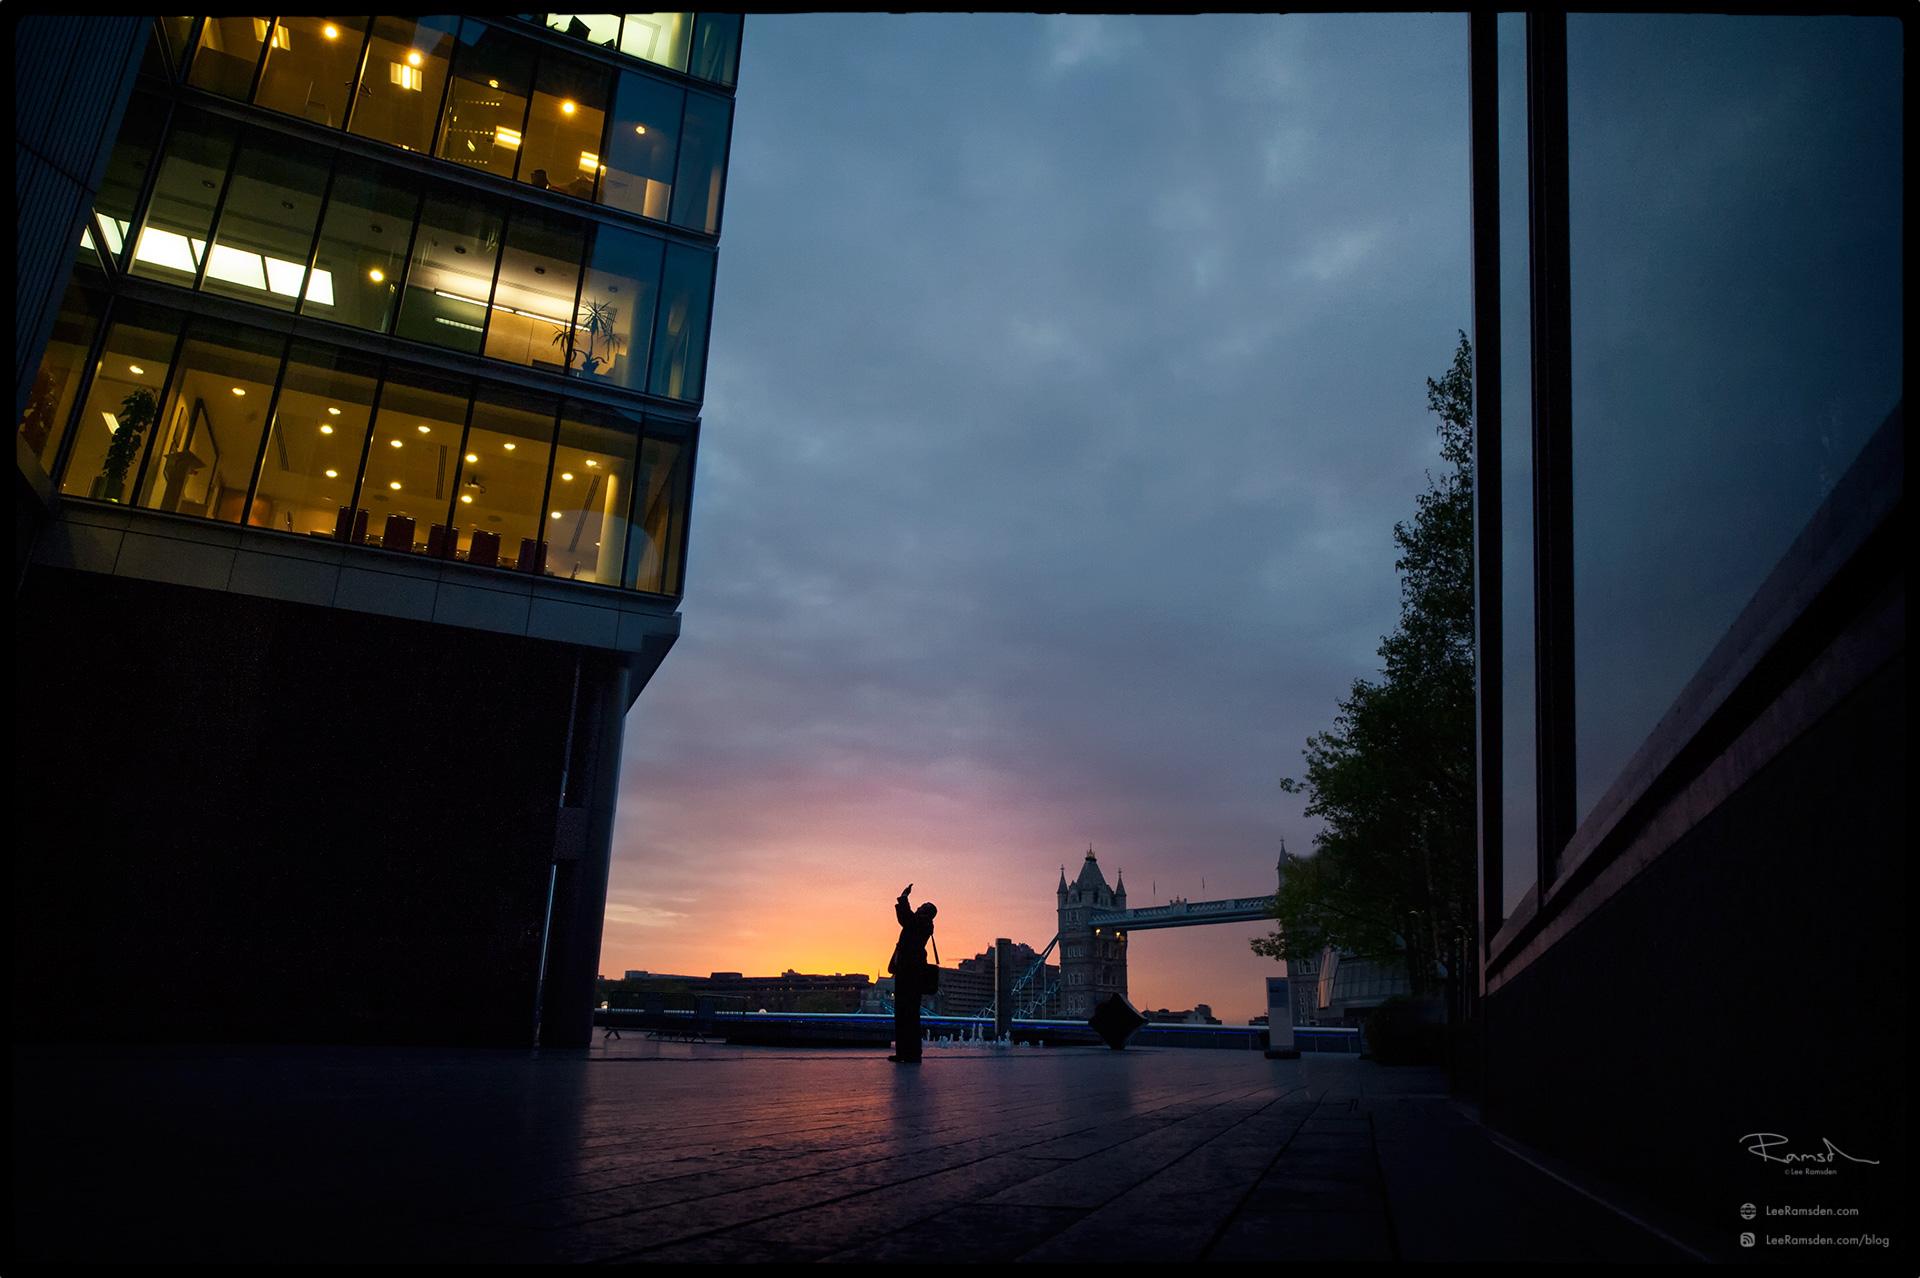 "<img src=""unknown photographer.jpg"" alt=""unrise sunset london city moreLondon tower Bridge office building reflection clouds Lee Ramsden"">"